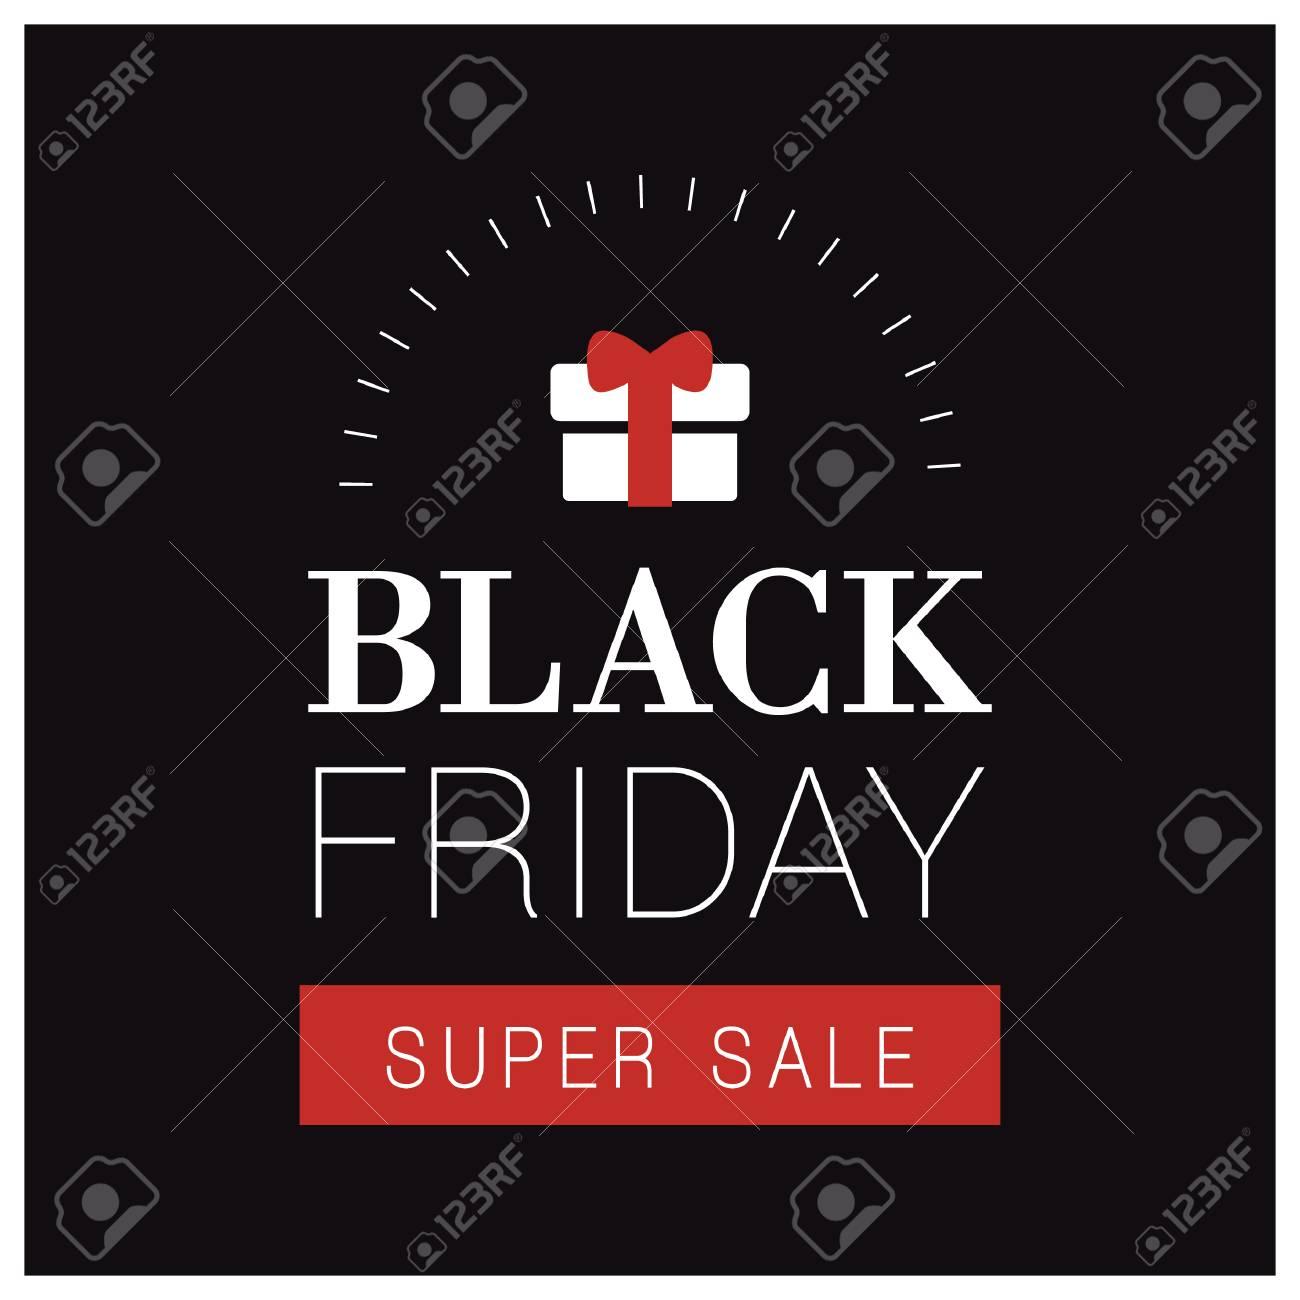 Black Friday Sale Wallpaper Royalty Cliparts Vectors And 1300x1300